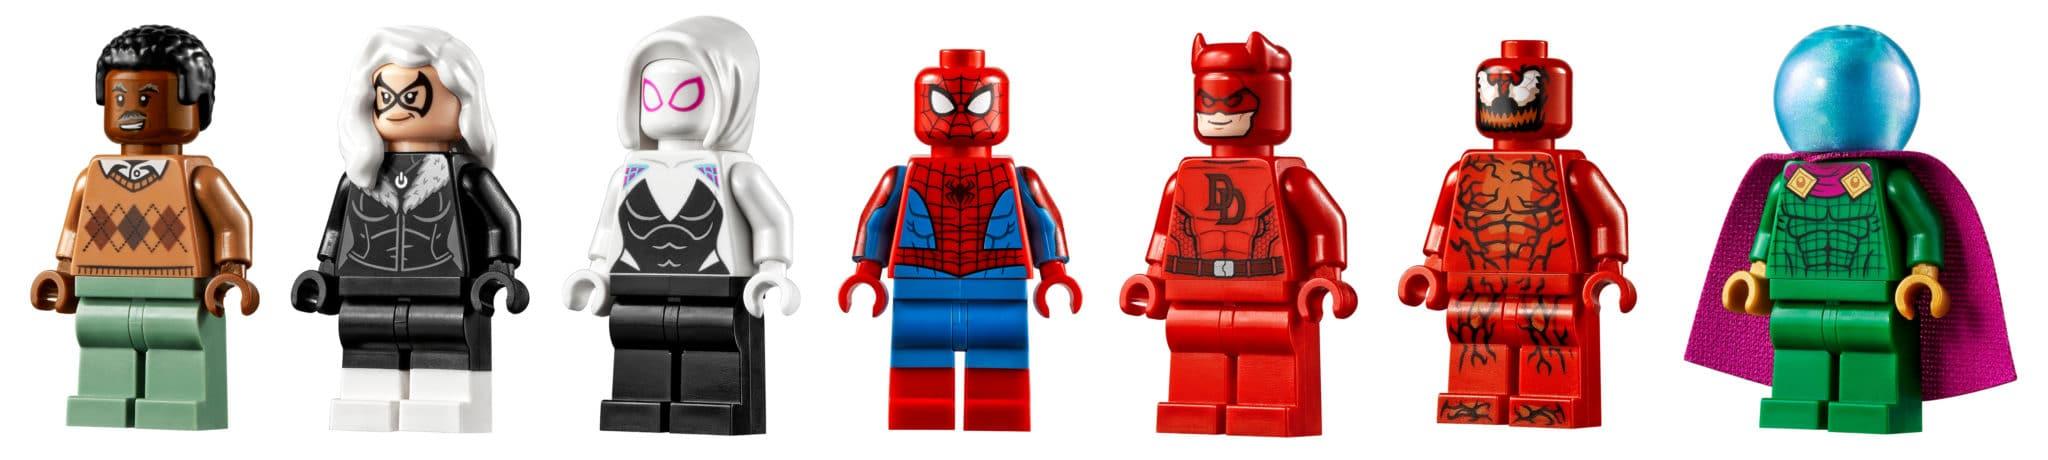 LEGO Marvel 76178 Daily Bugle Minifiguren